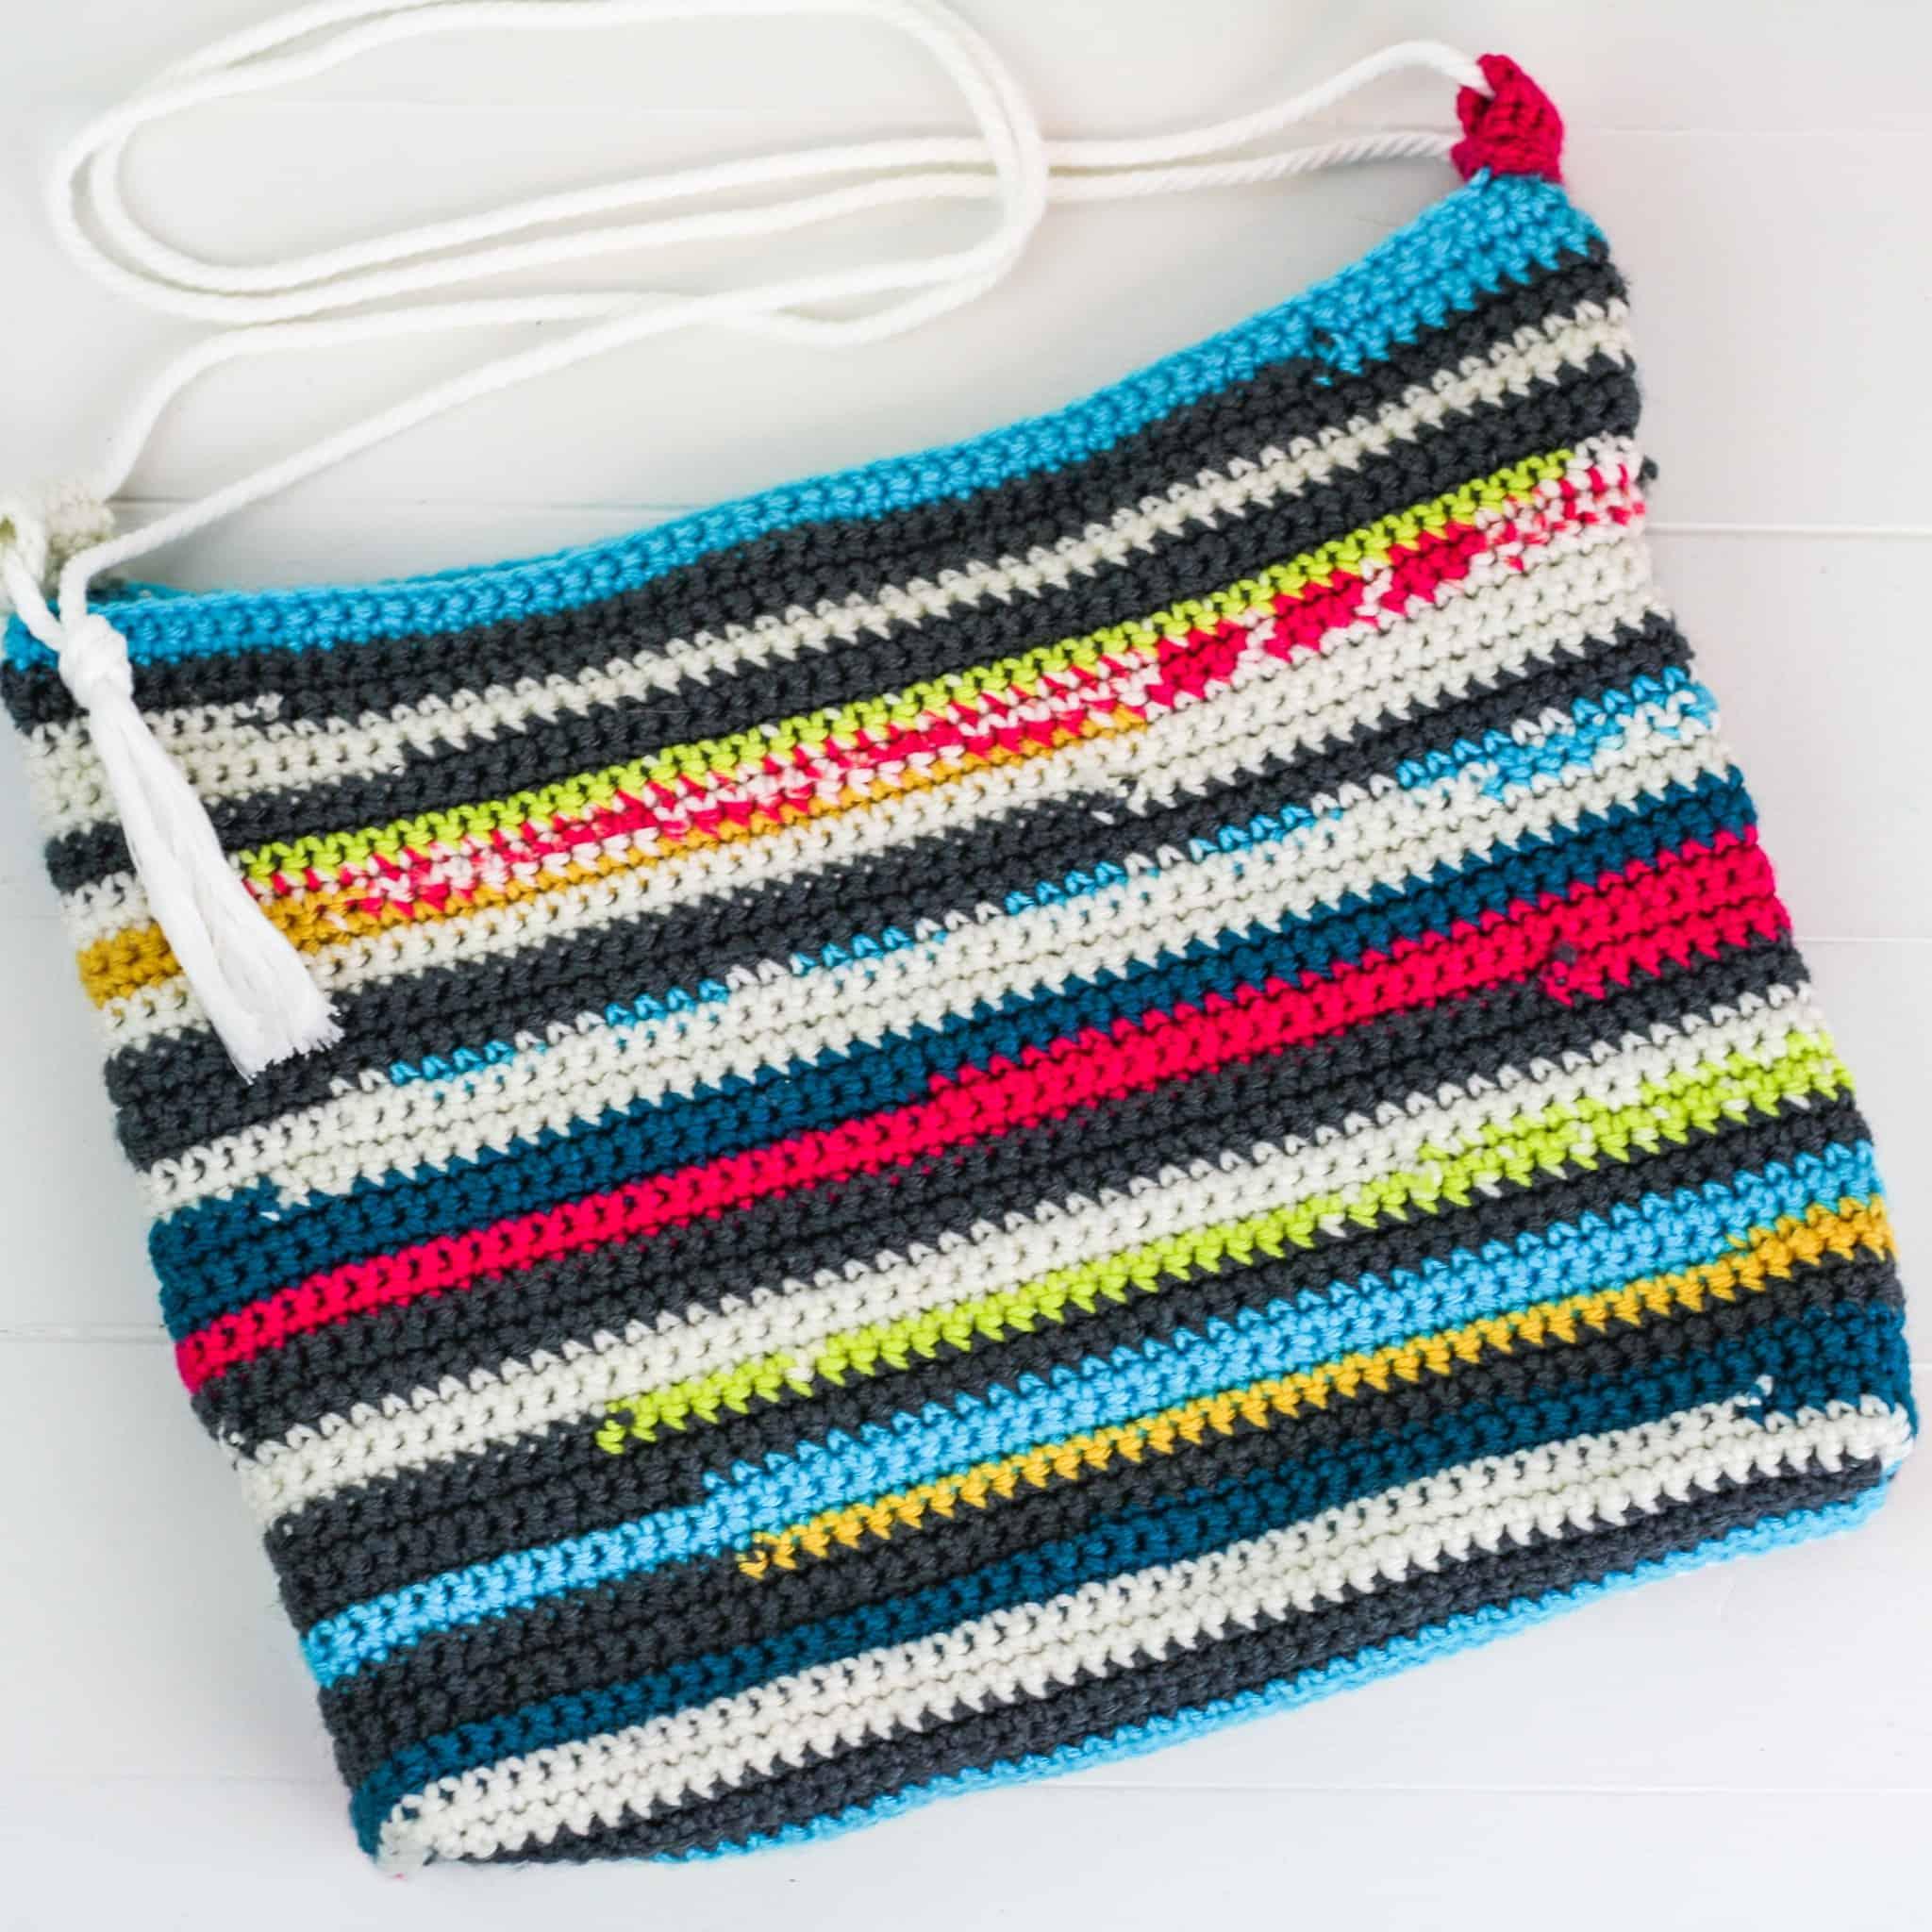 Crochet Scraps Bag